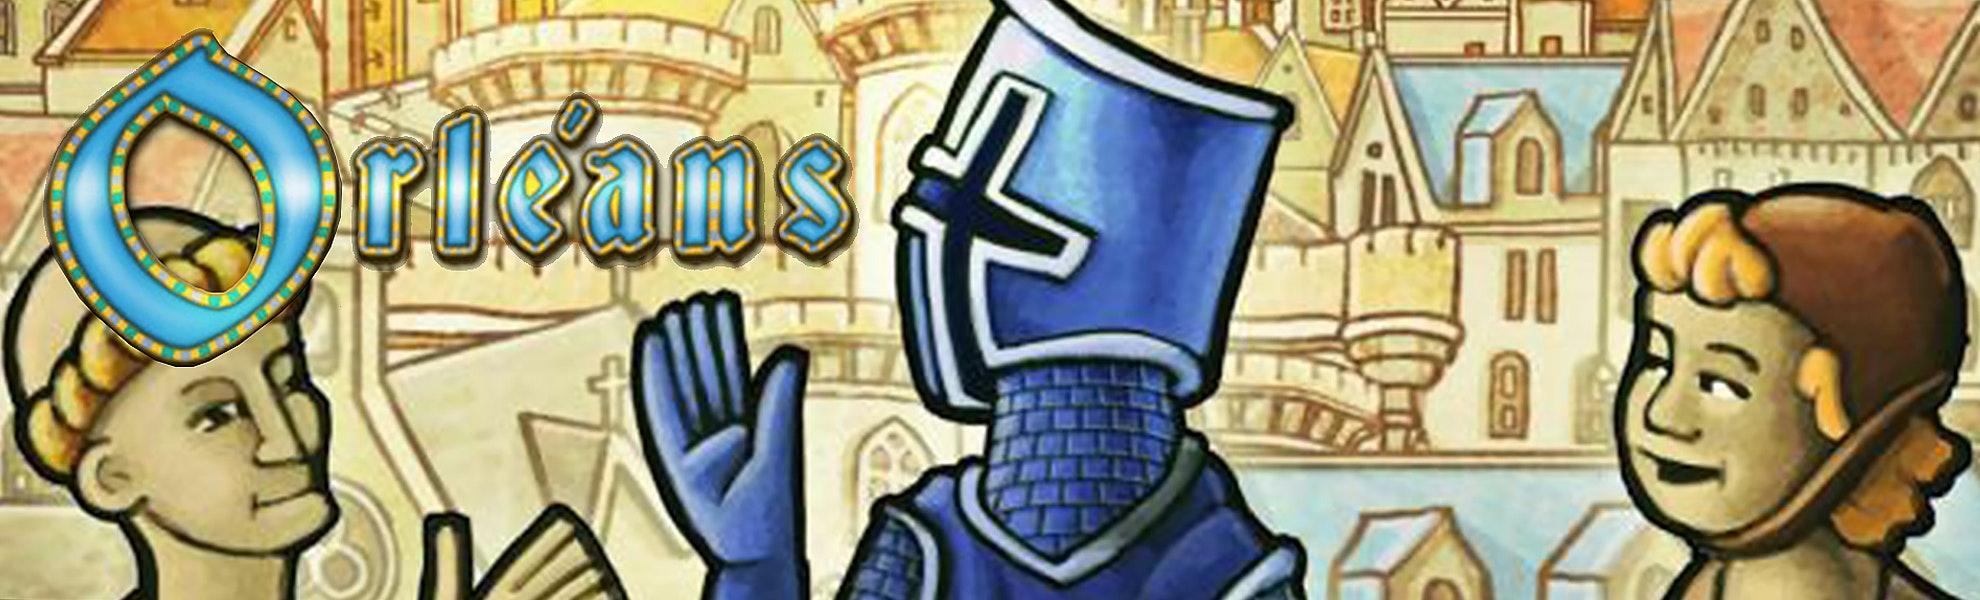 Orléans Board Game Bundle